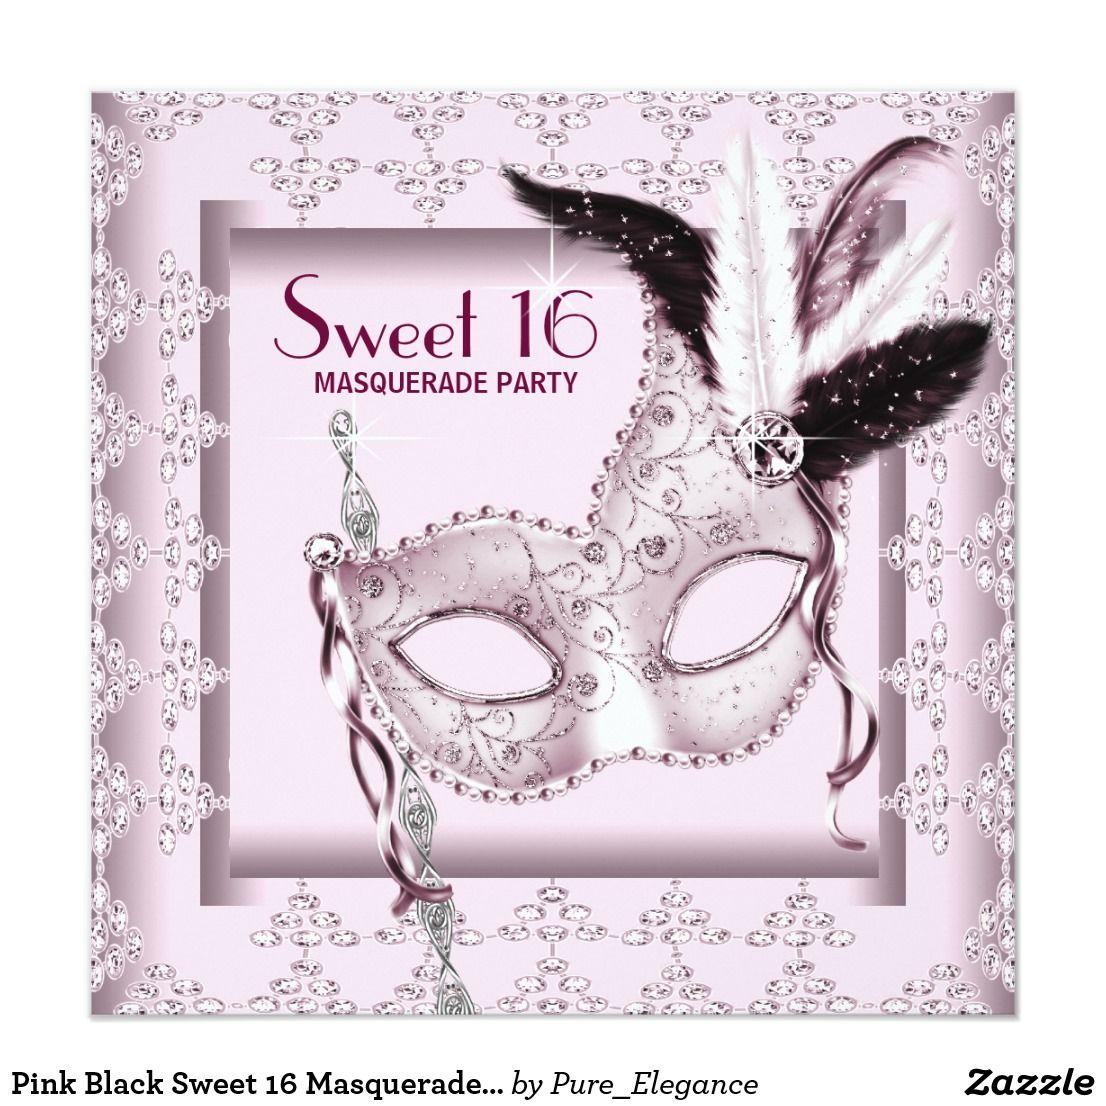 Pink Black Sweet 16 Masquerade Party Card | Sweet 16 masquerade ...